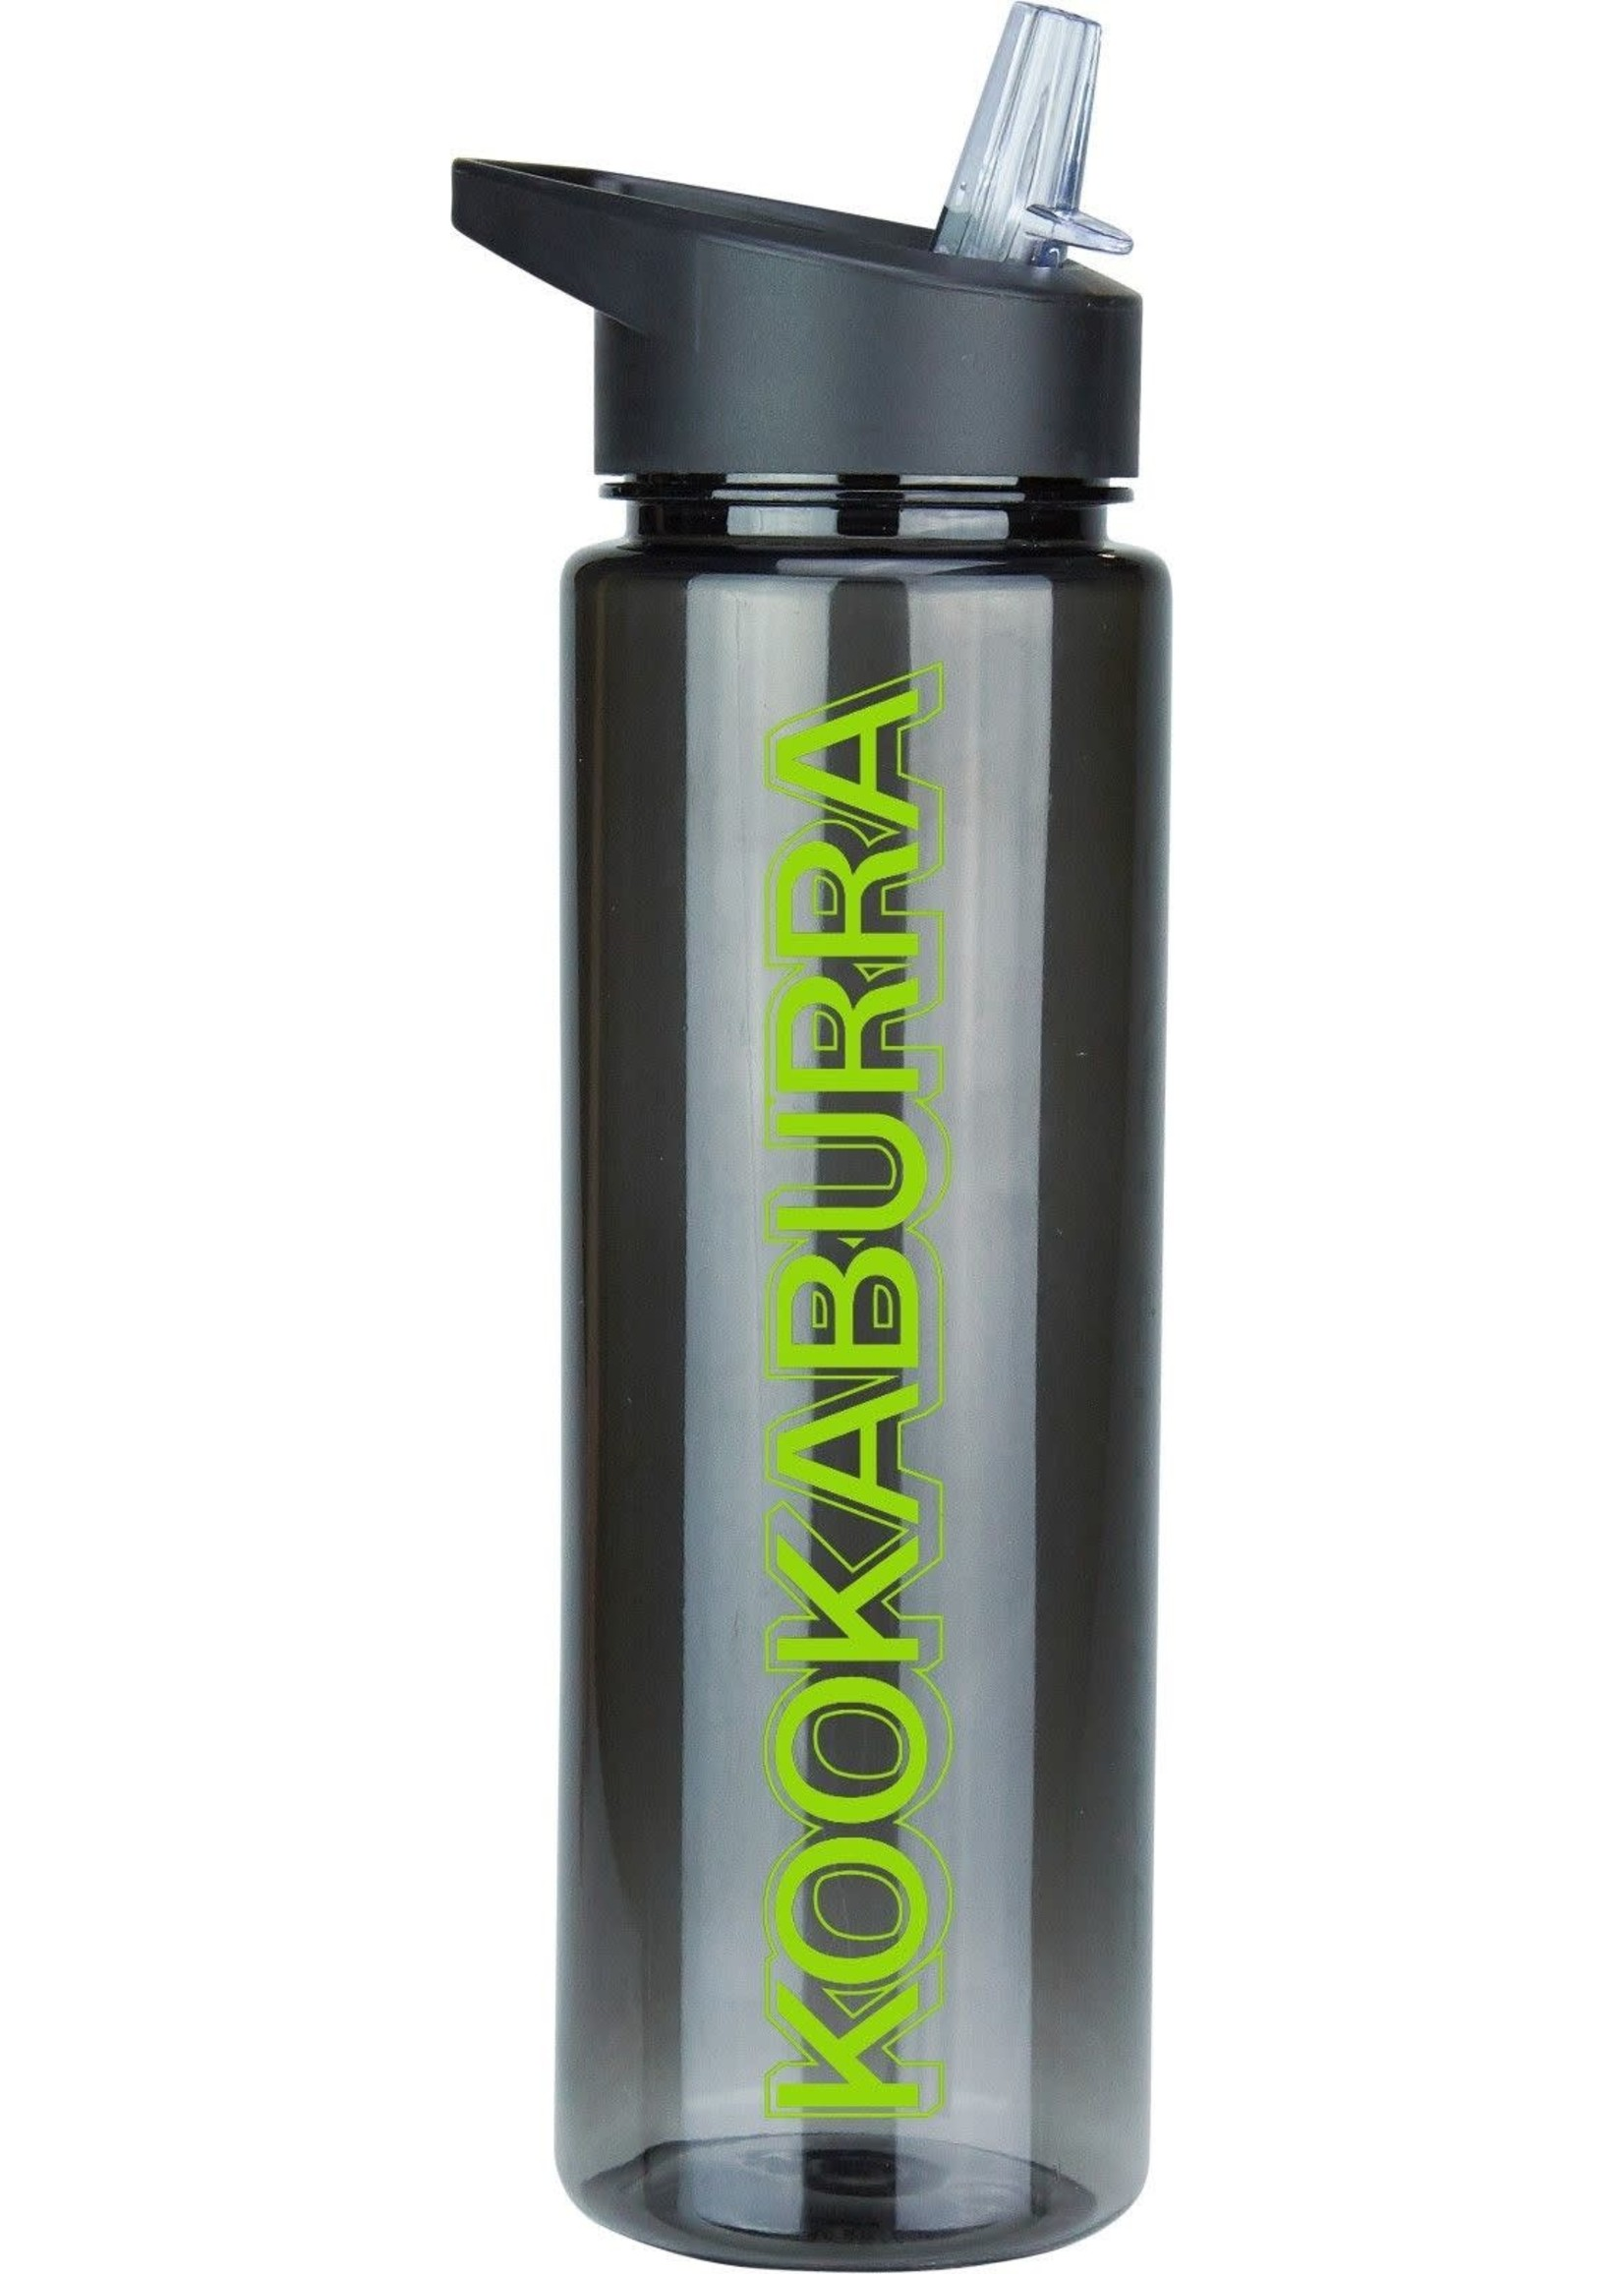 Kookaburra Kookaburra Water Bottle 750ml